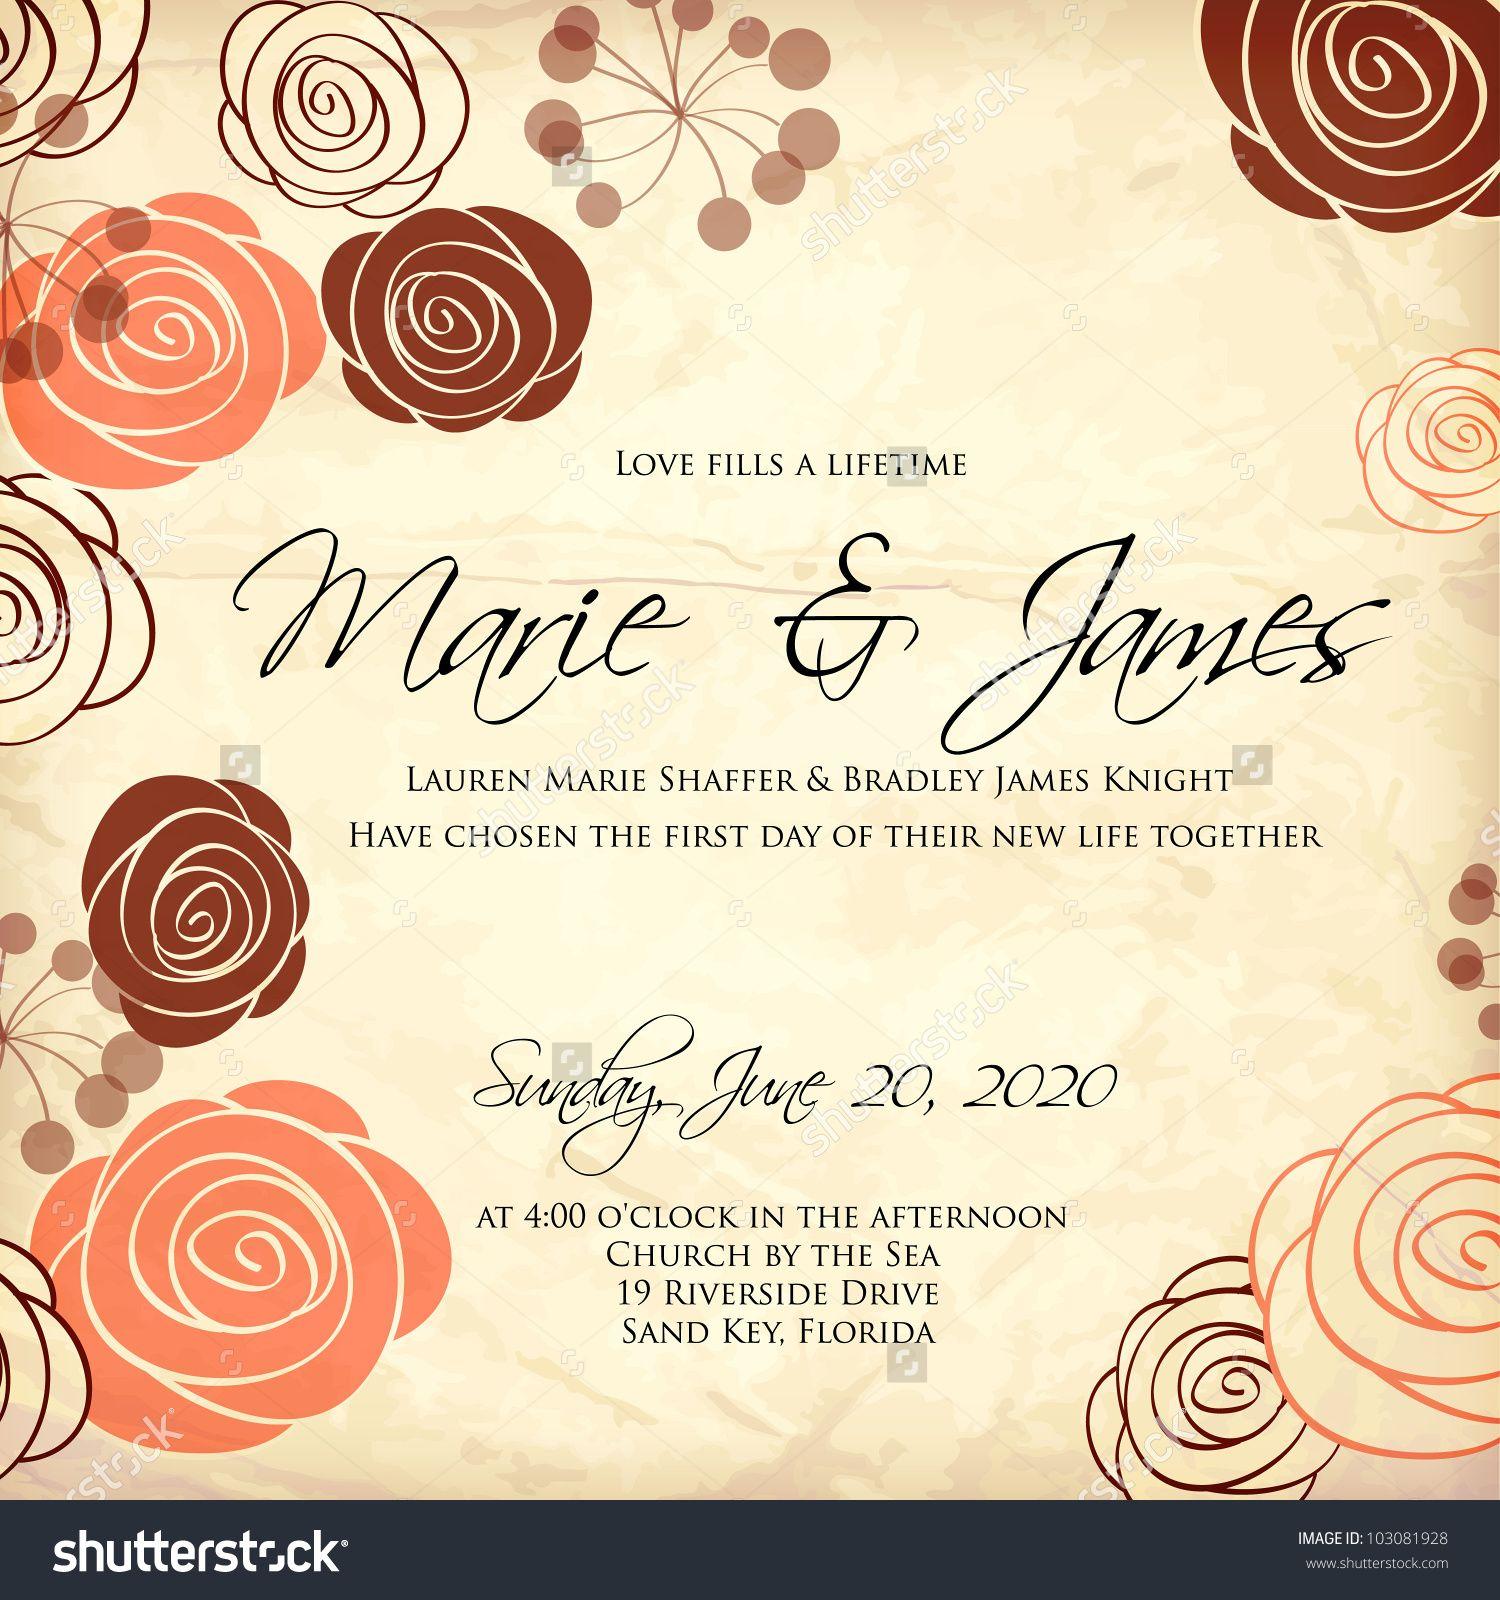 Pin by anggit wirawan on Wedding Invitation Inspiration